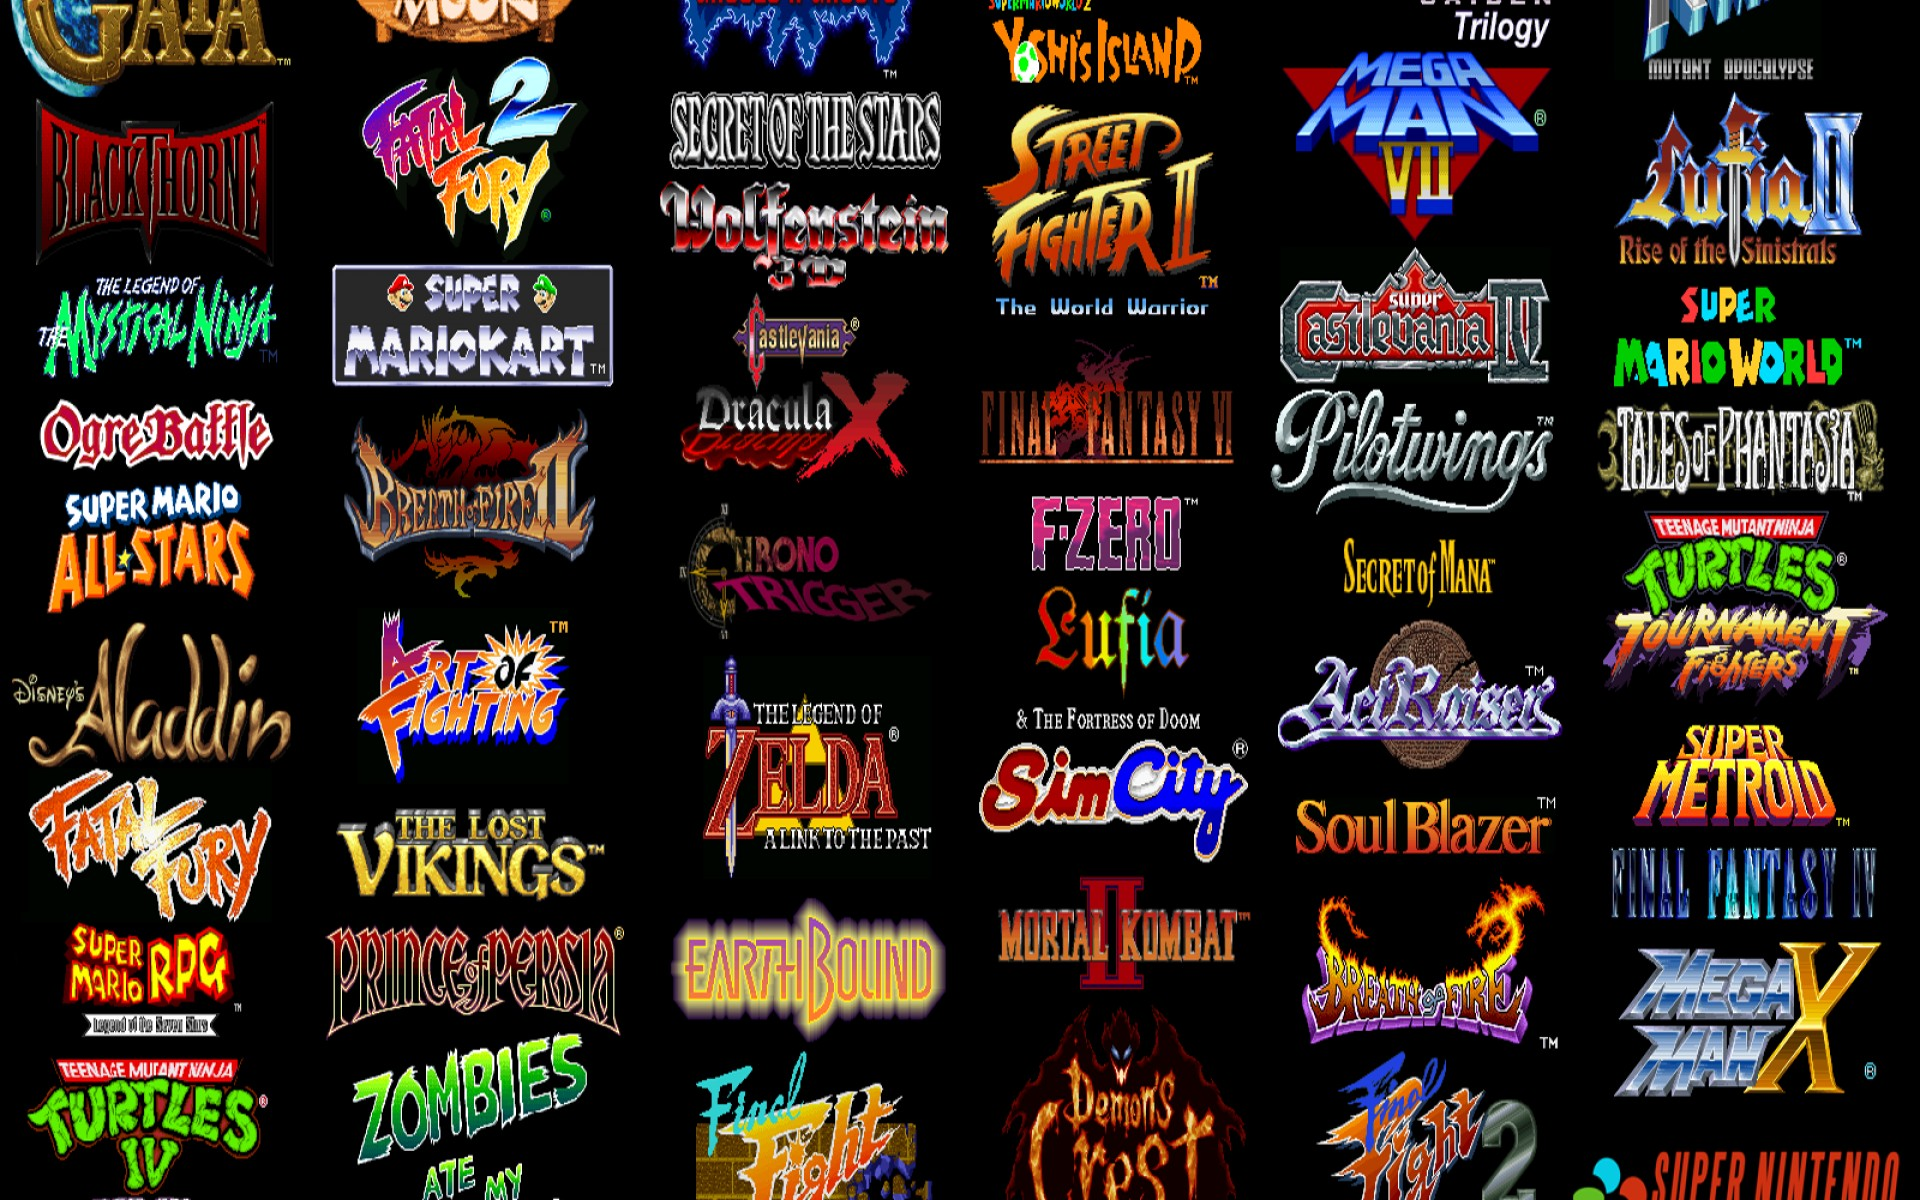 Free download Video games super nintendo retro games